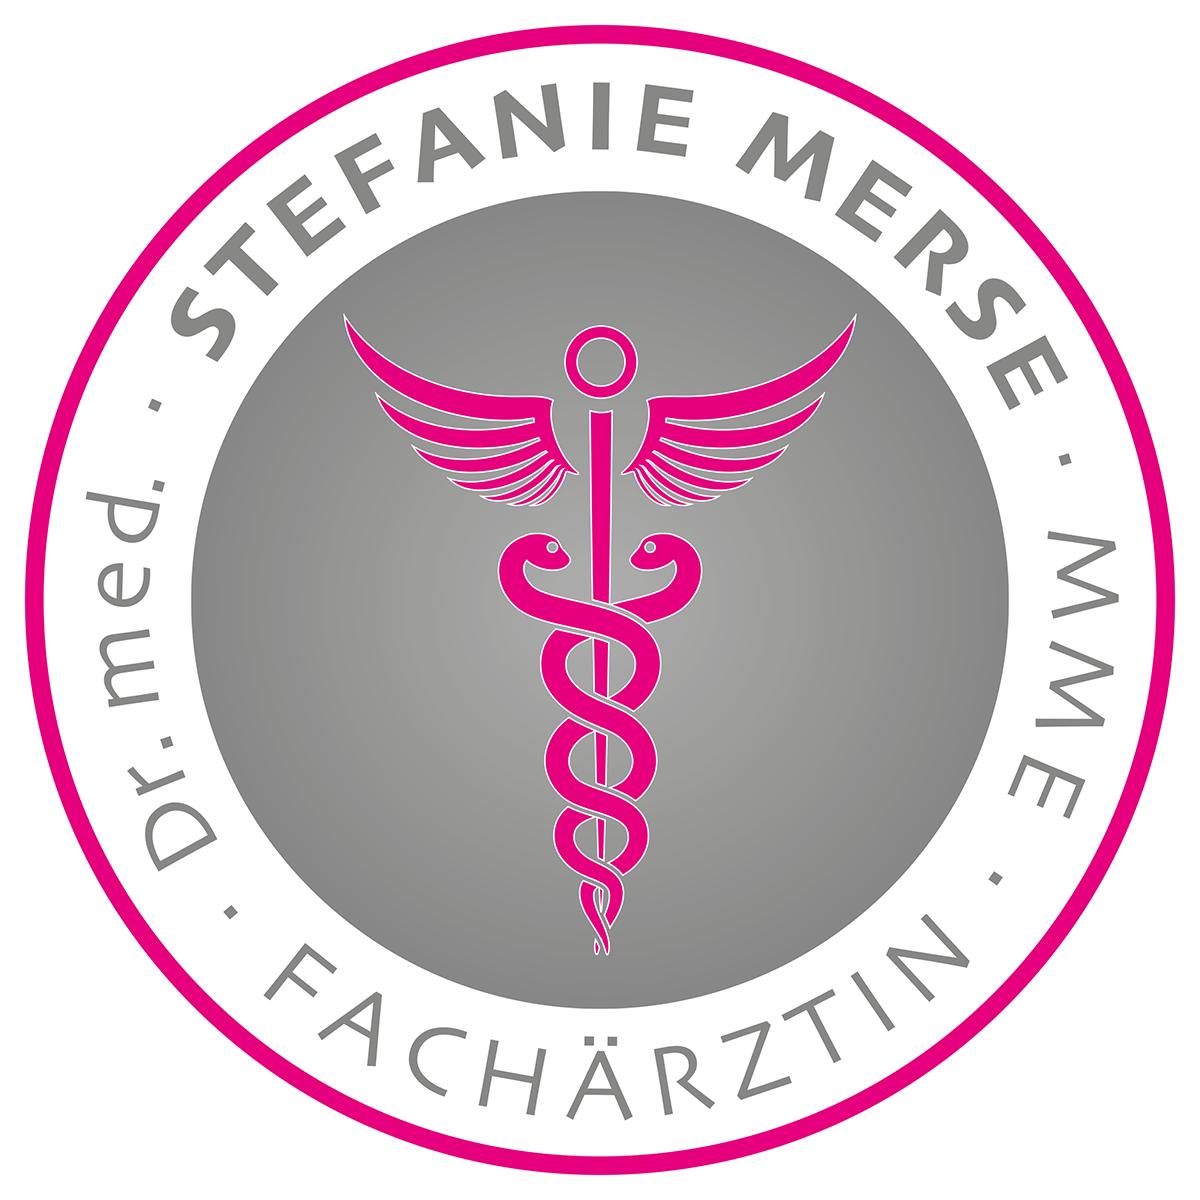 Dr. med. Stefanie Merse